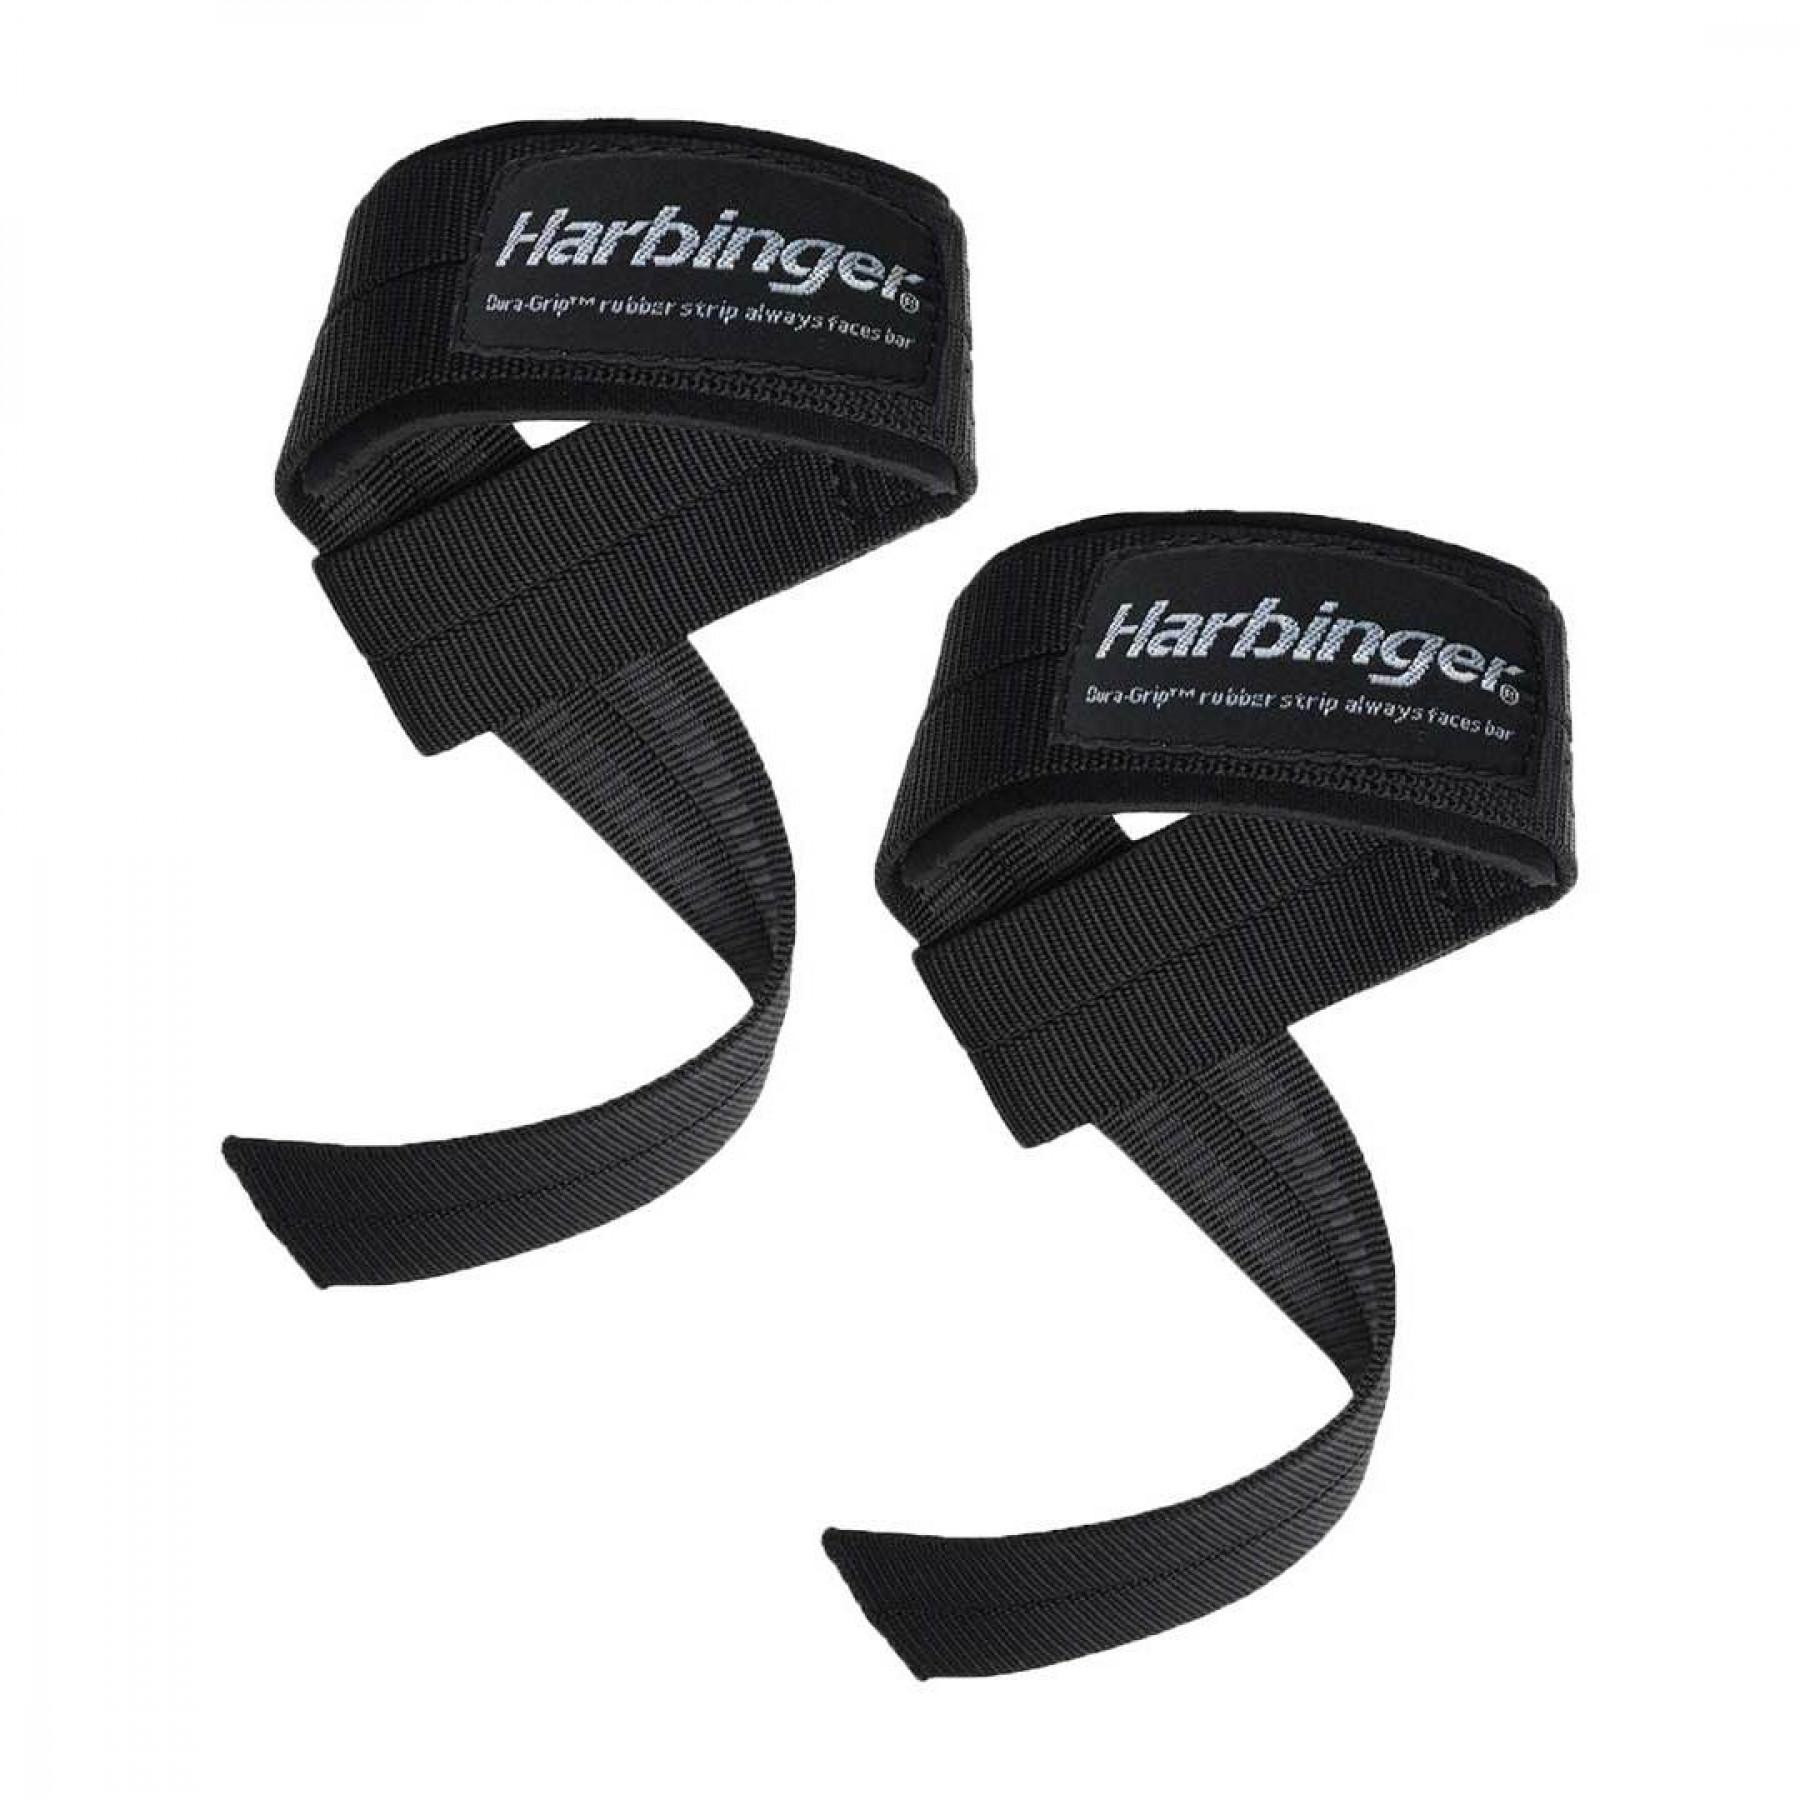 Wrist straps Harbinger Big Grip padded lifting straps